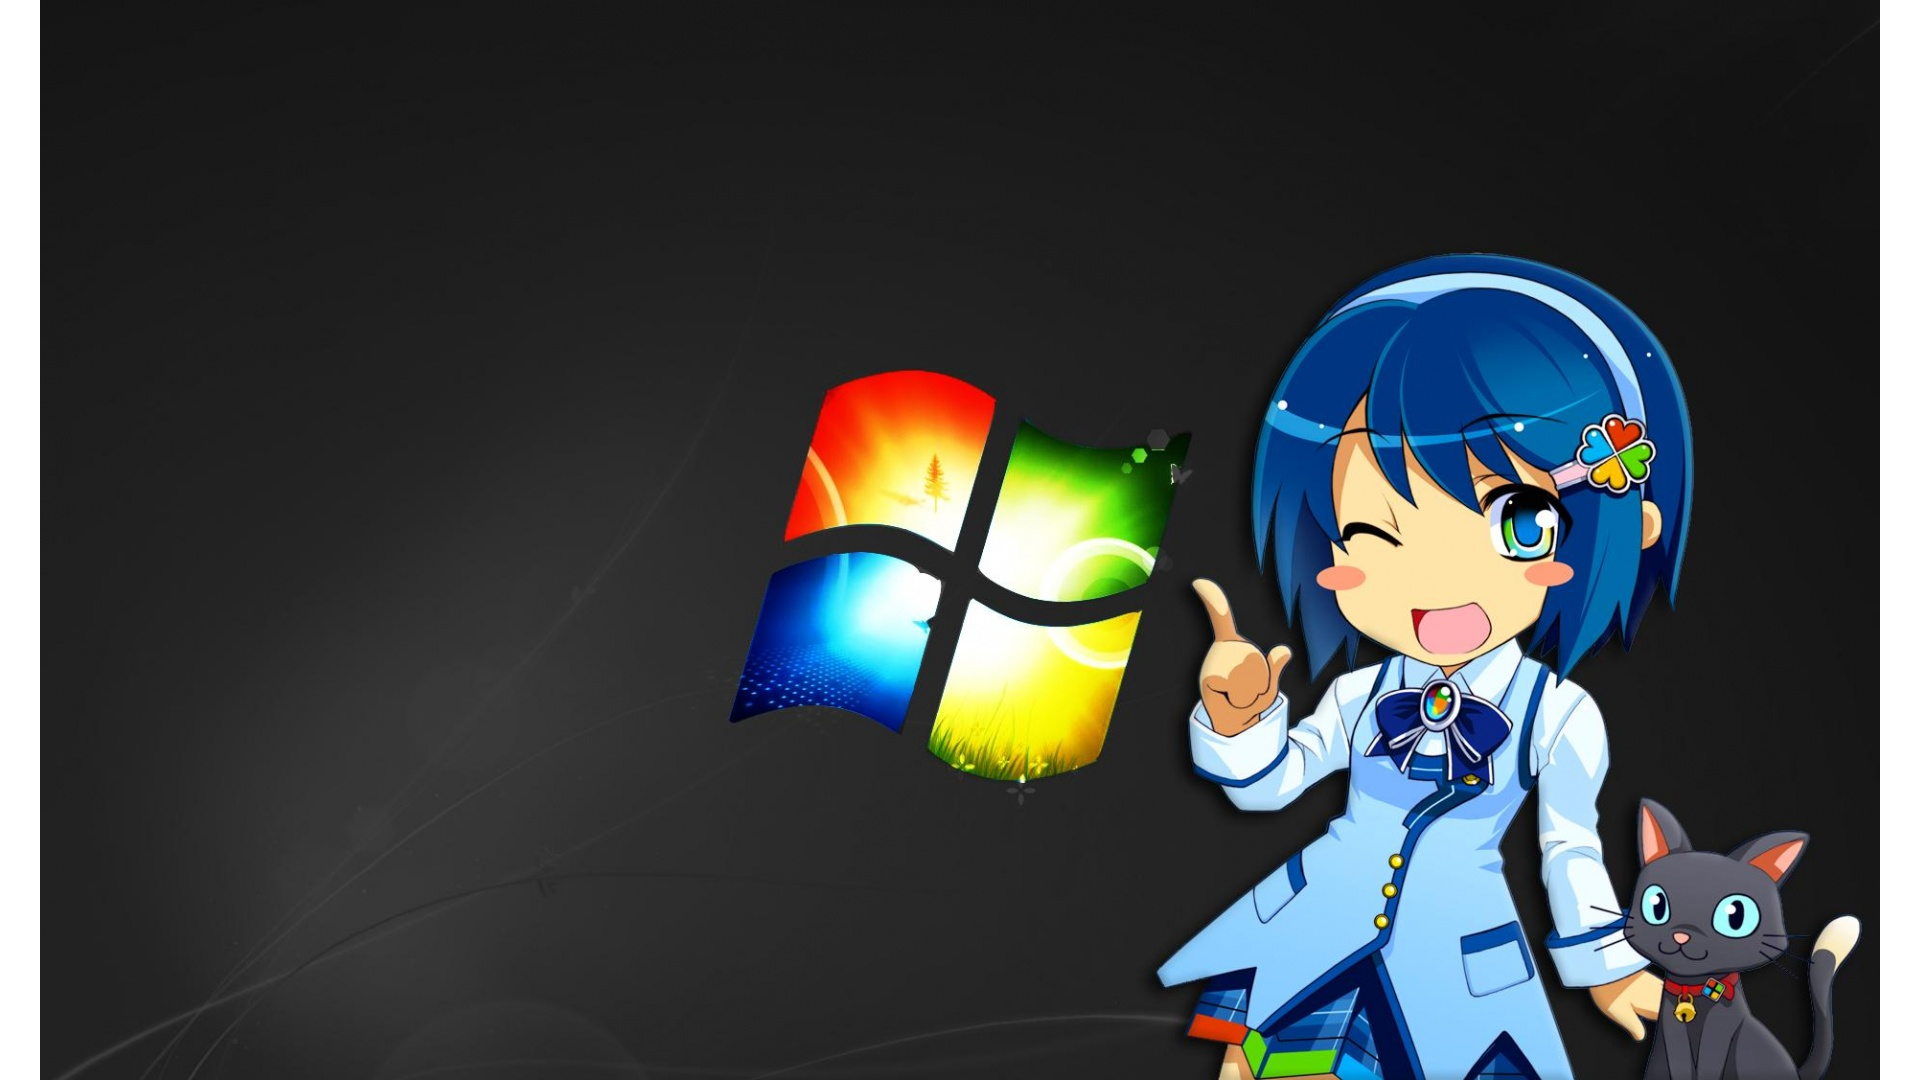 anime girl windows wallpaper wallpapers 1920x1080 1920x1080